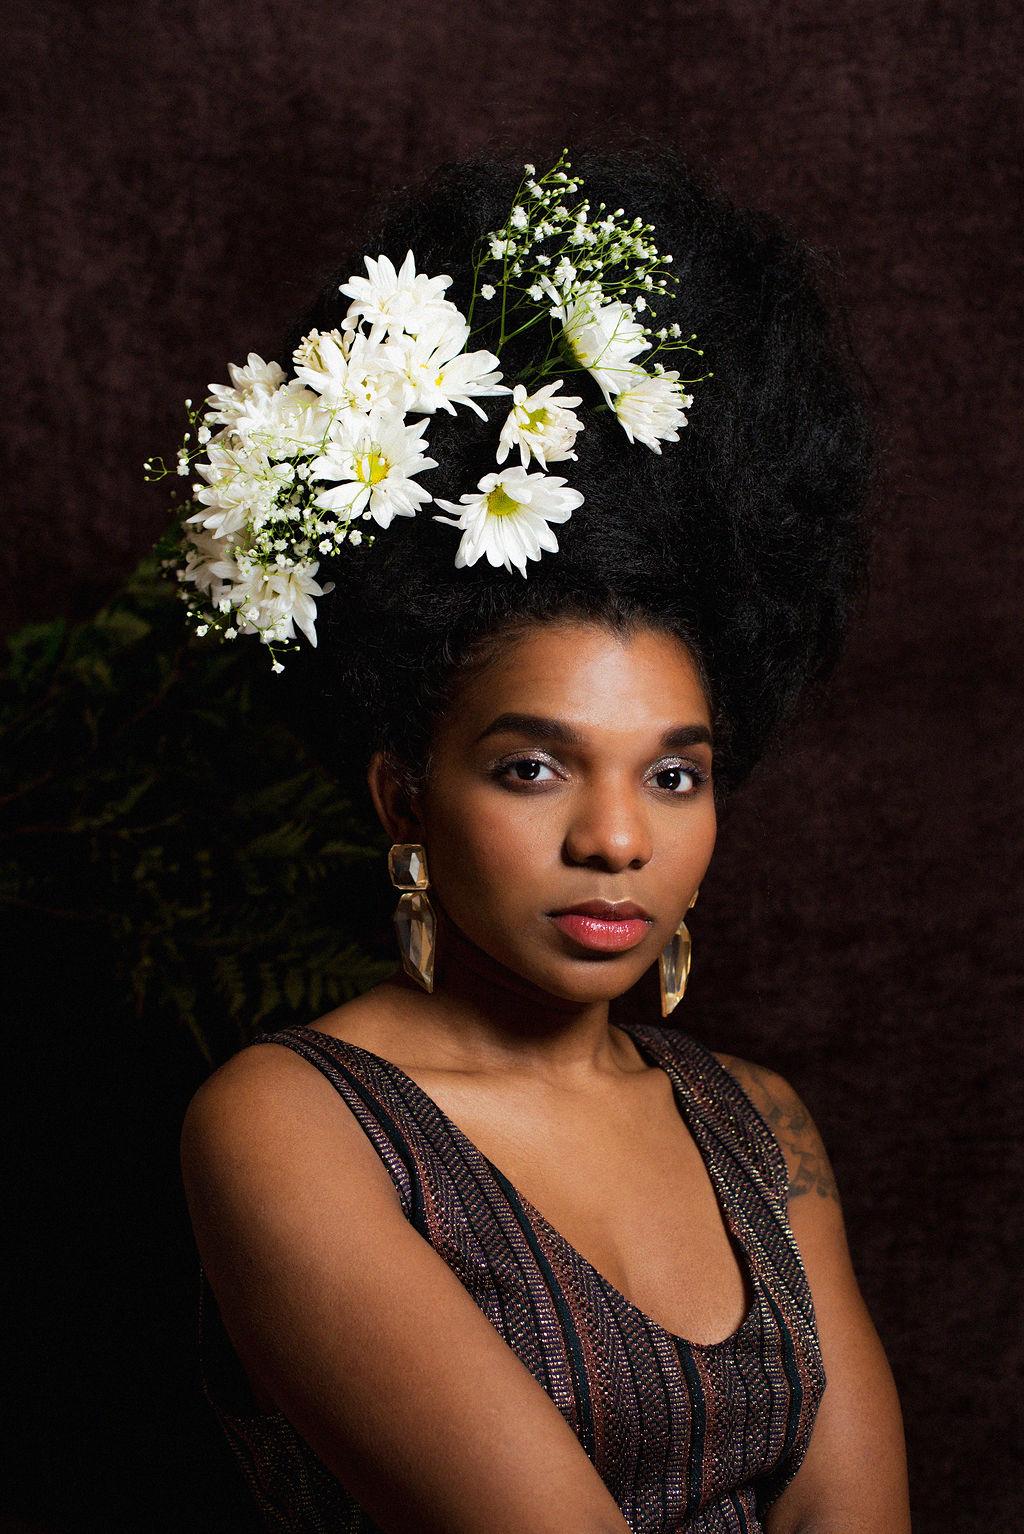 Osato Erebor's Stunning New Photo Series Is an Empowering Celebration of Black Beauty for #BlackHistoryMonth